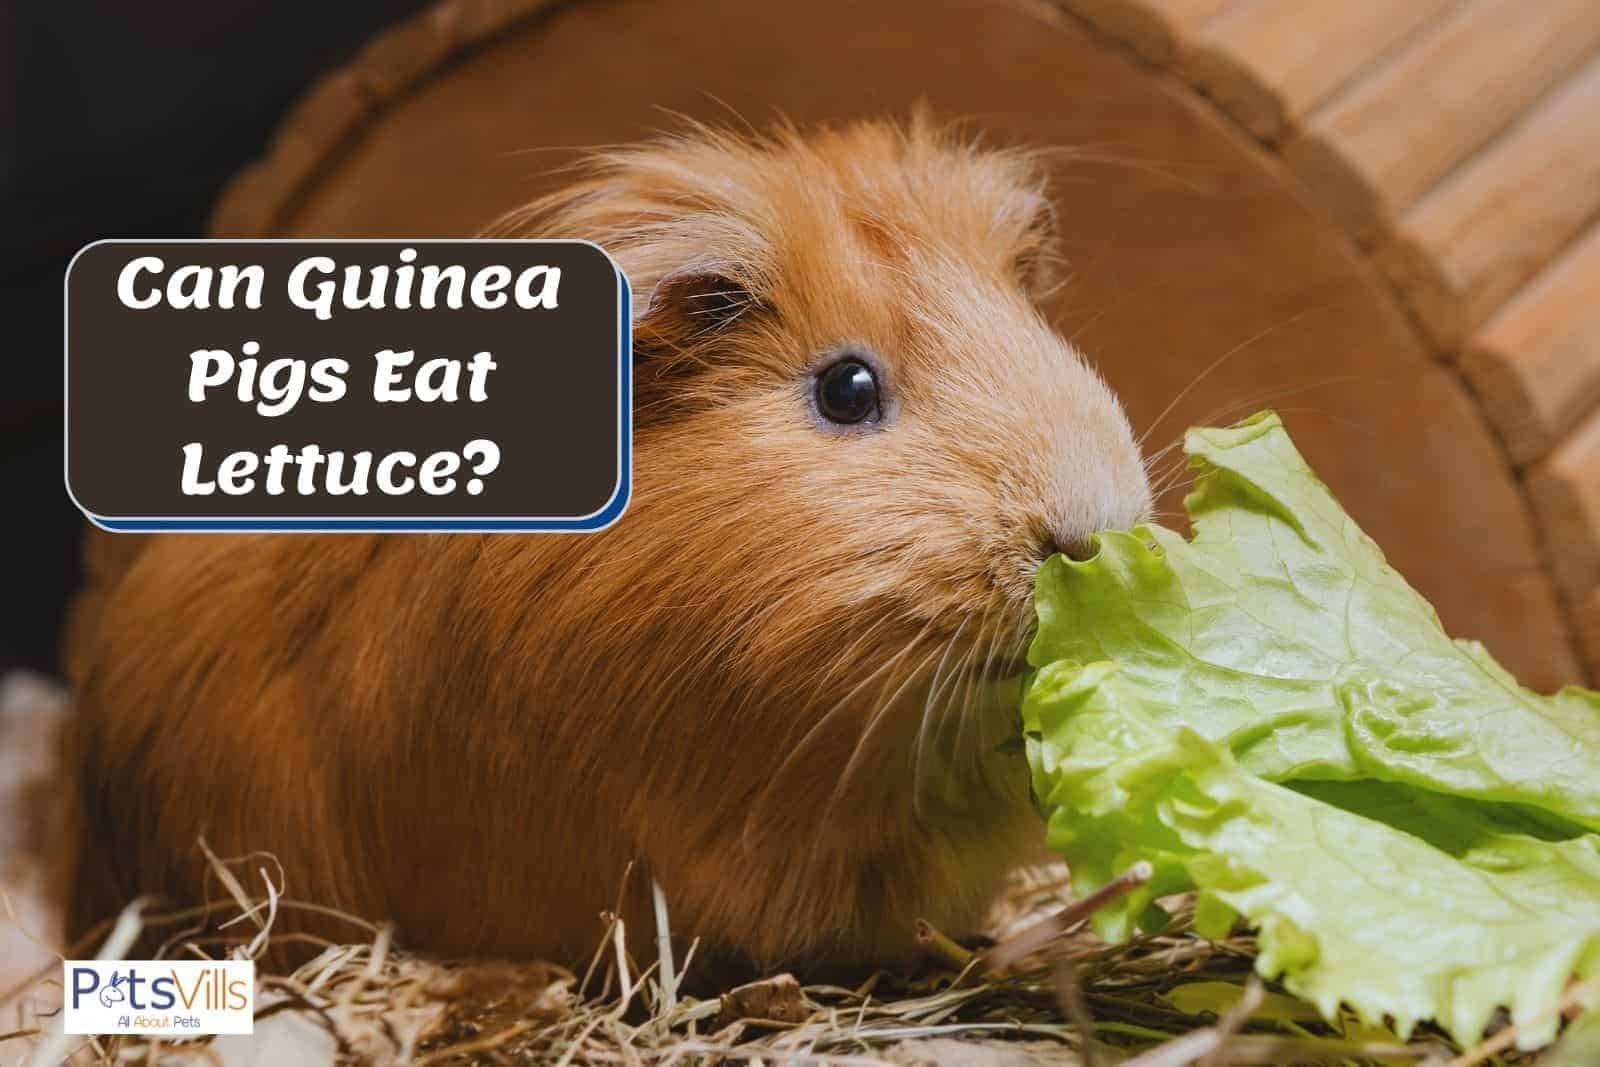 guinea pig smelling a lettuce but can guinea pigs eat lettuce?